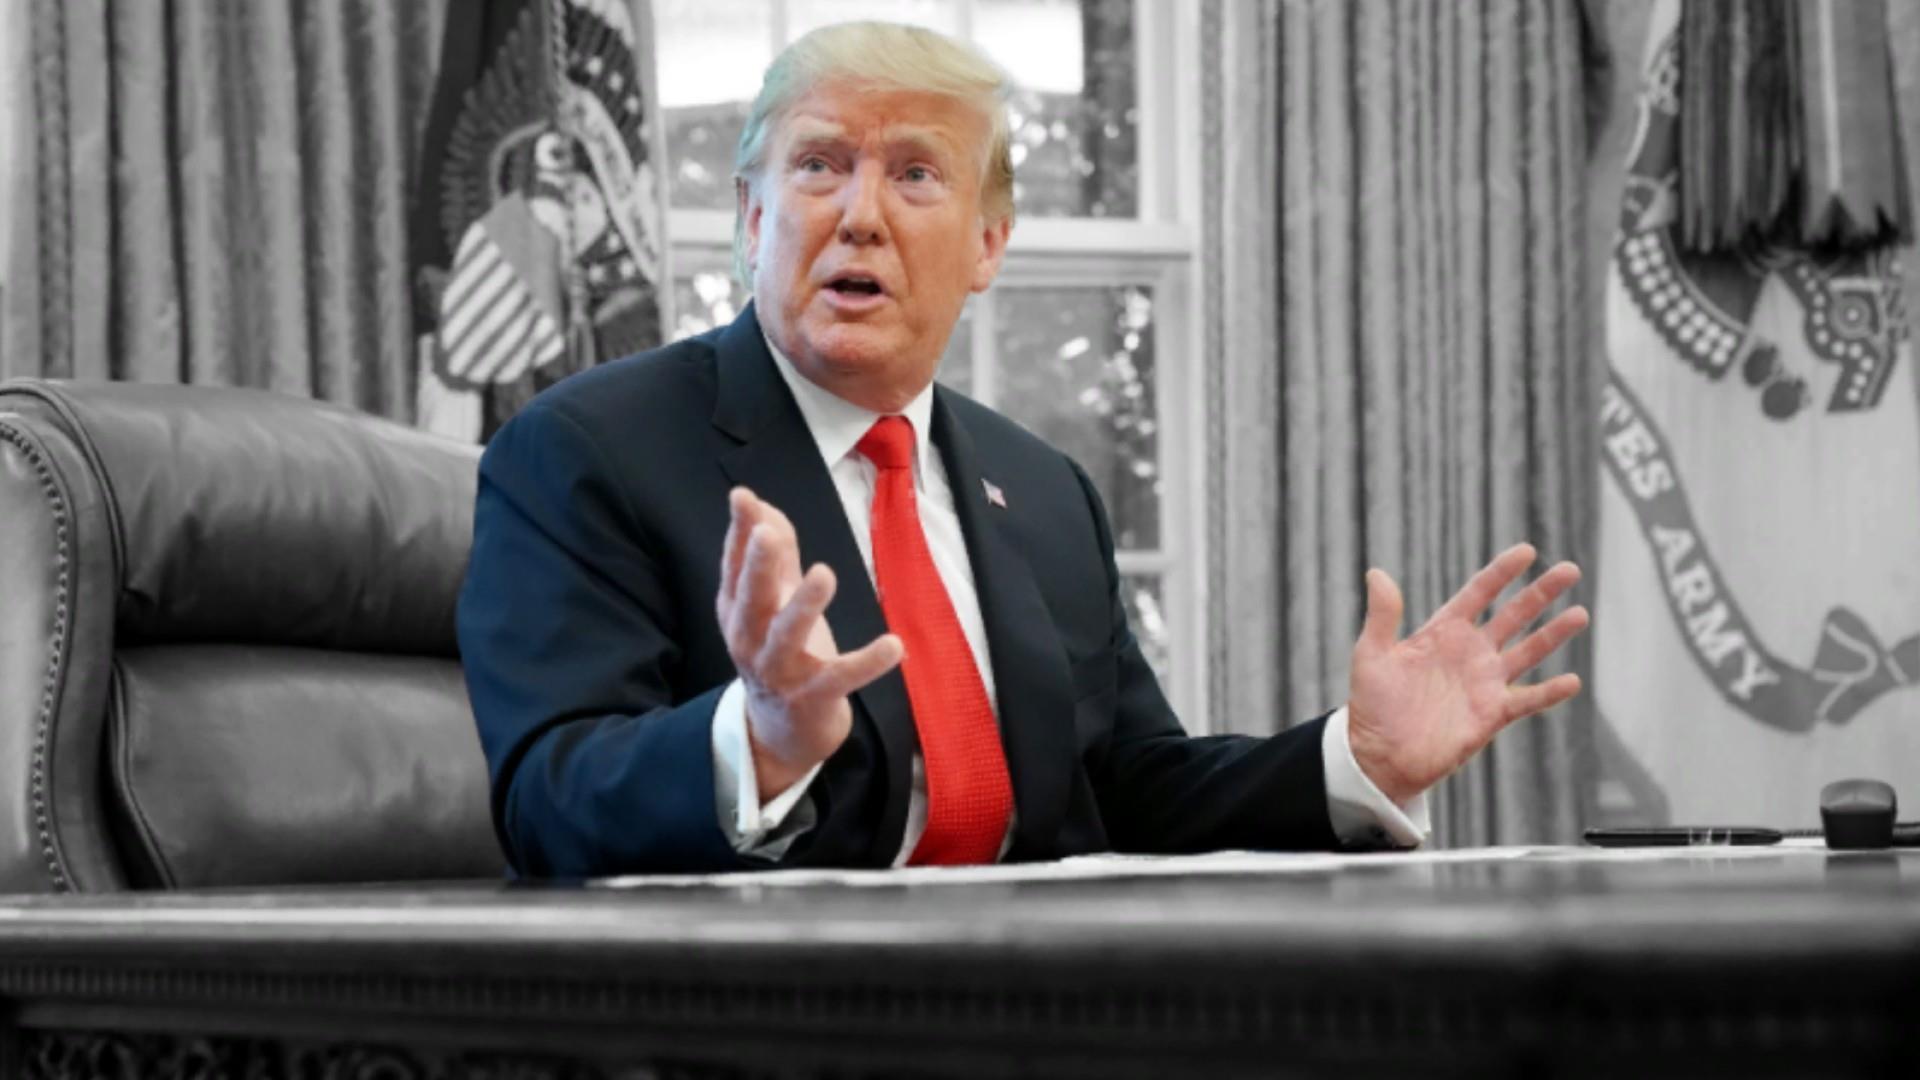 Dems' Trump investigation to-do list: Hush money, dangled pardons, impeachment, etc.